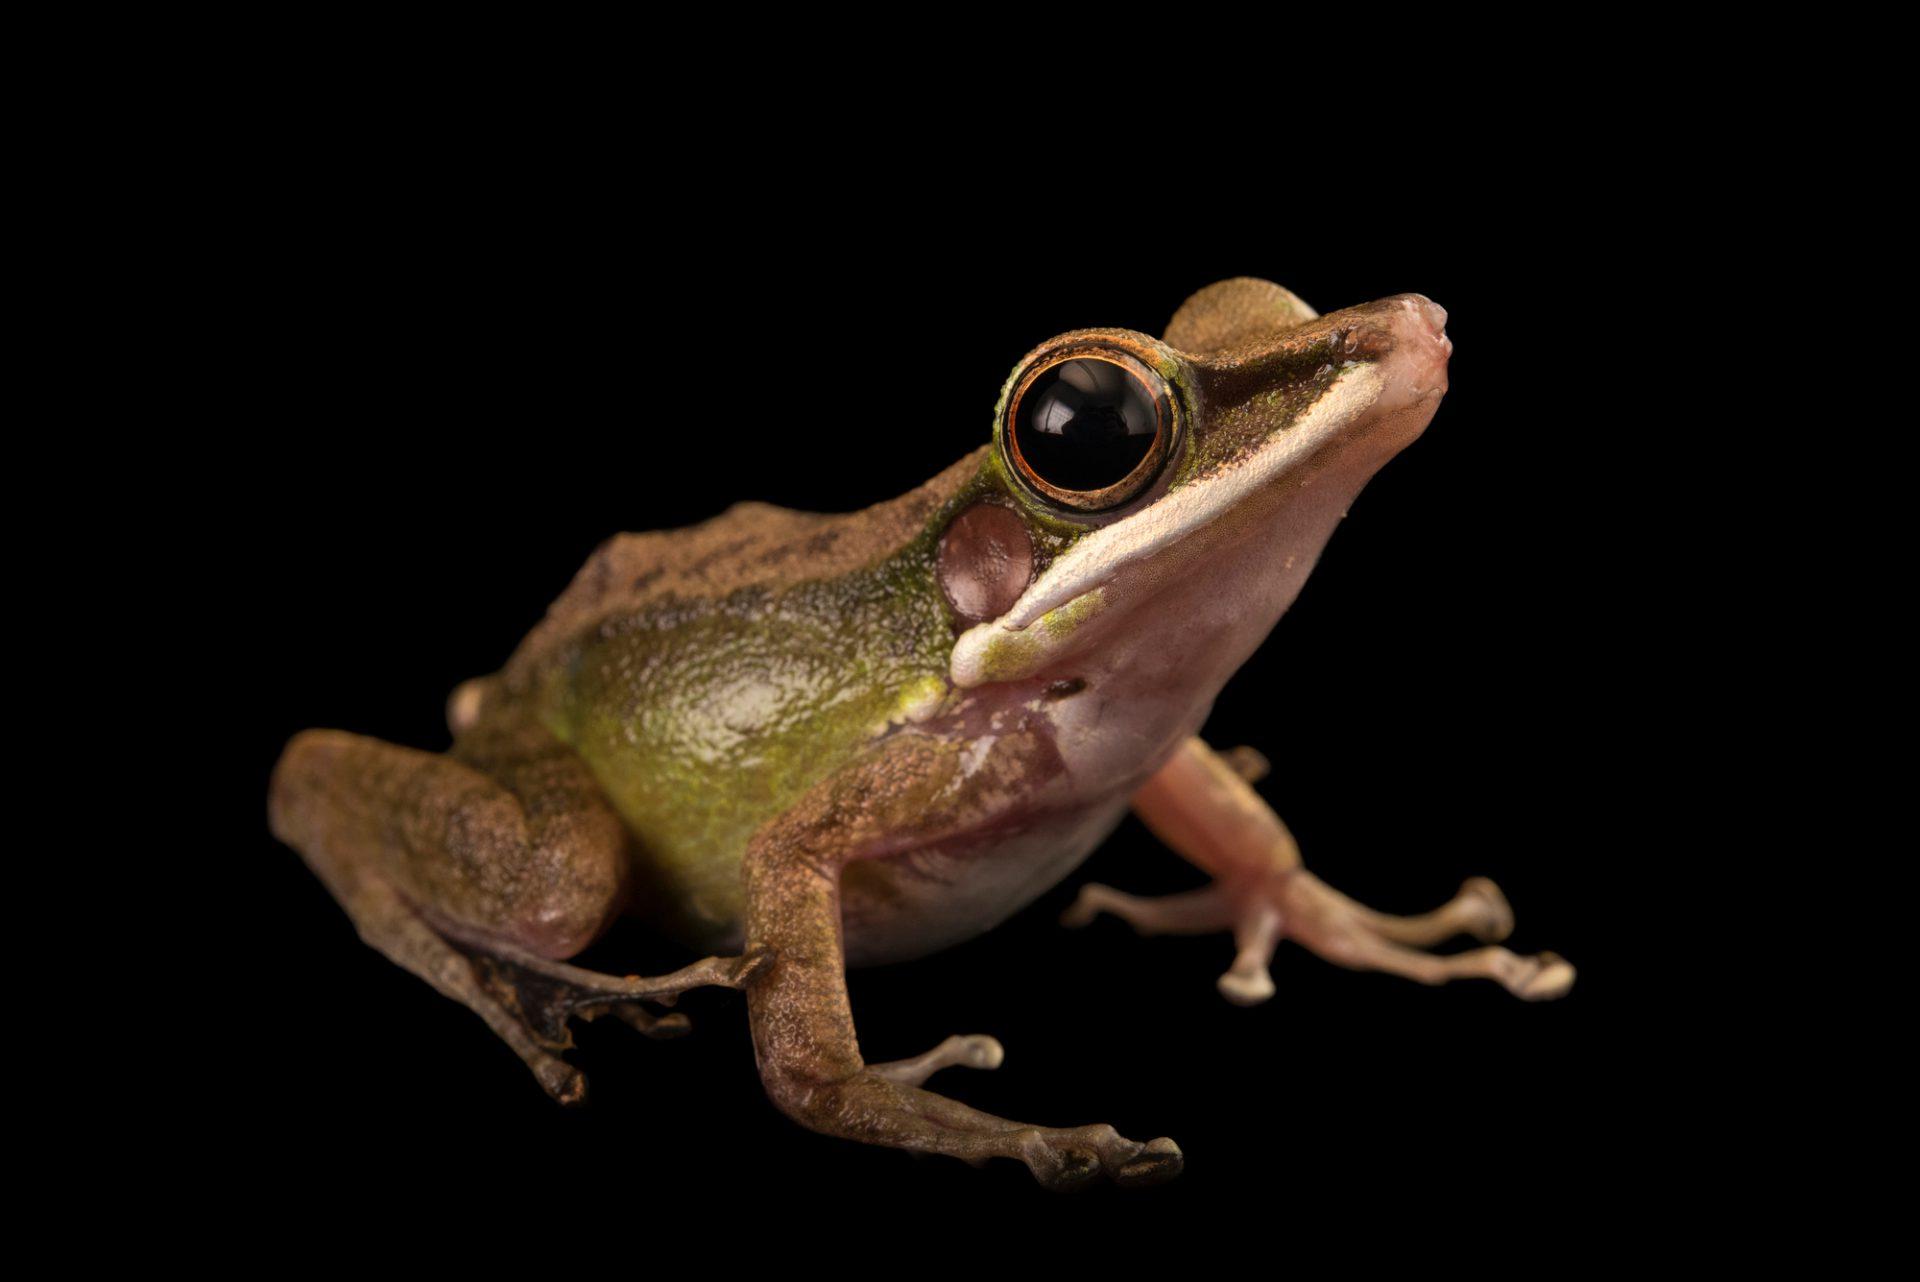 Photo: Poisonous Hose's frogs (Odorrana hosii) at the Singapore Zoo.